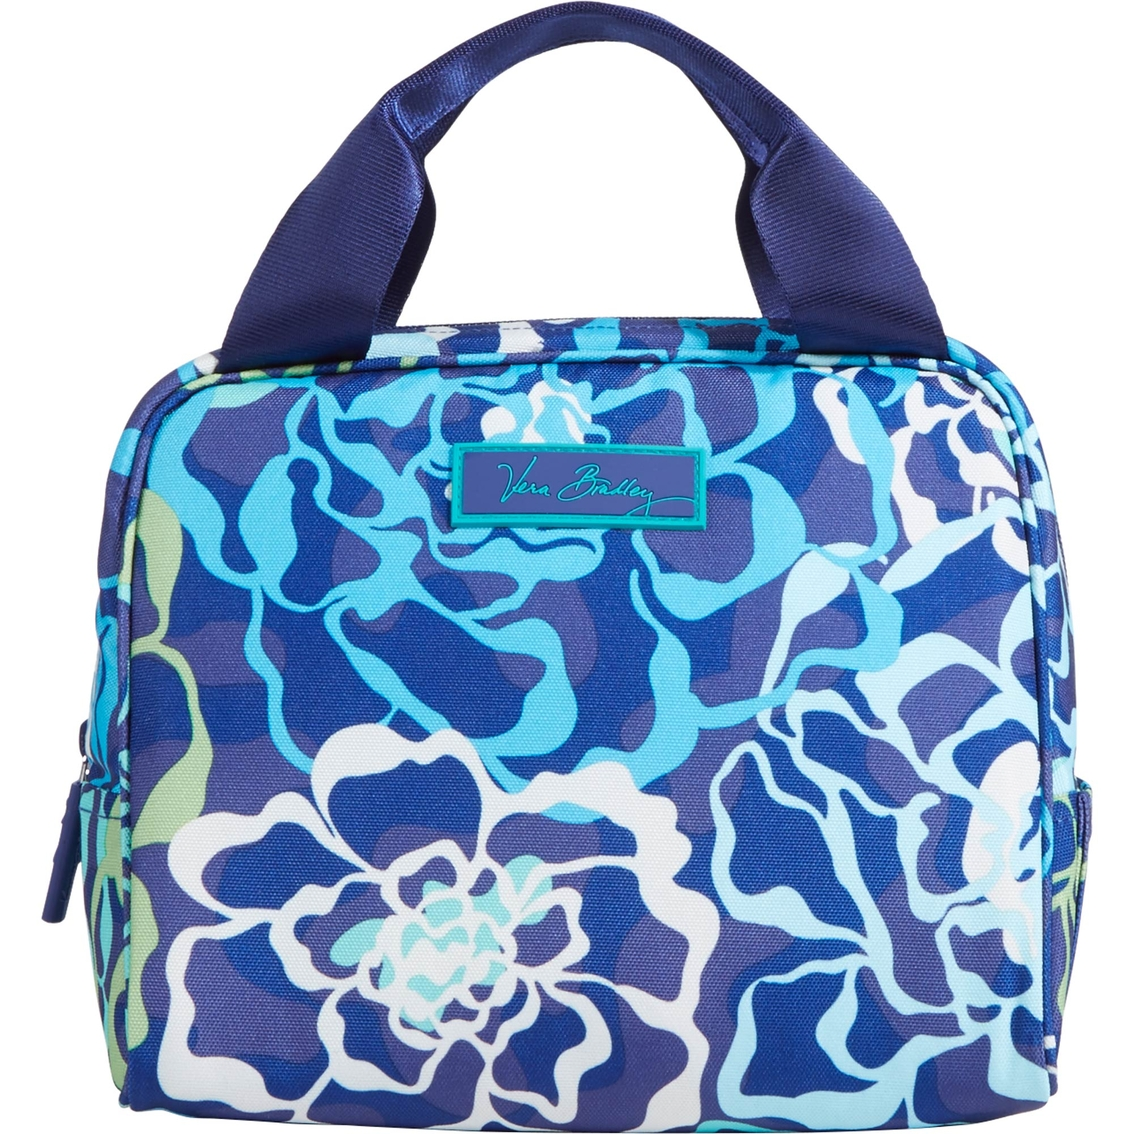 Vera Bradley Lighten Up Lunch Cooler Bag Katalina Blues